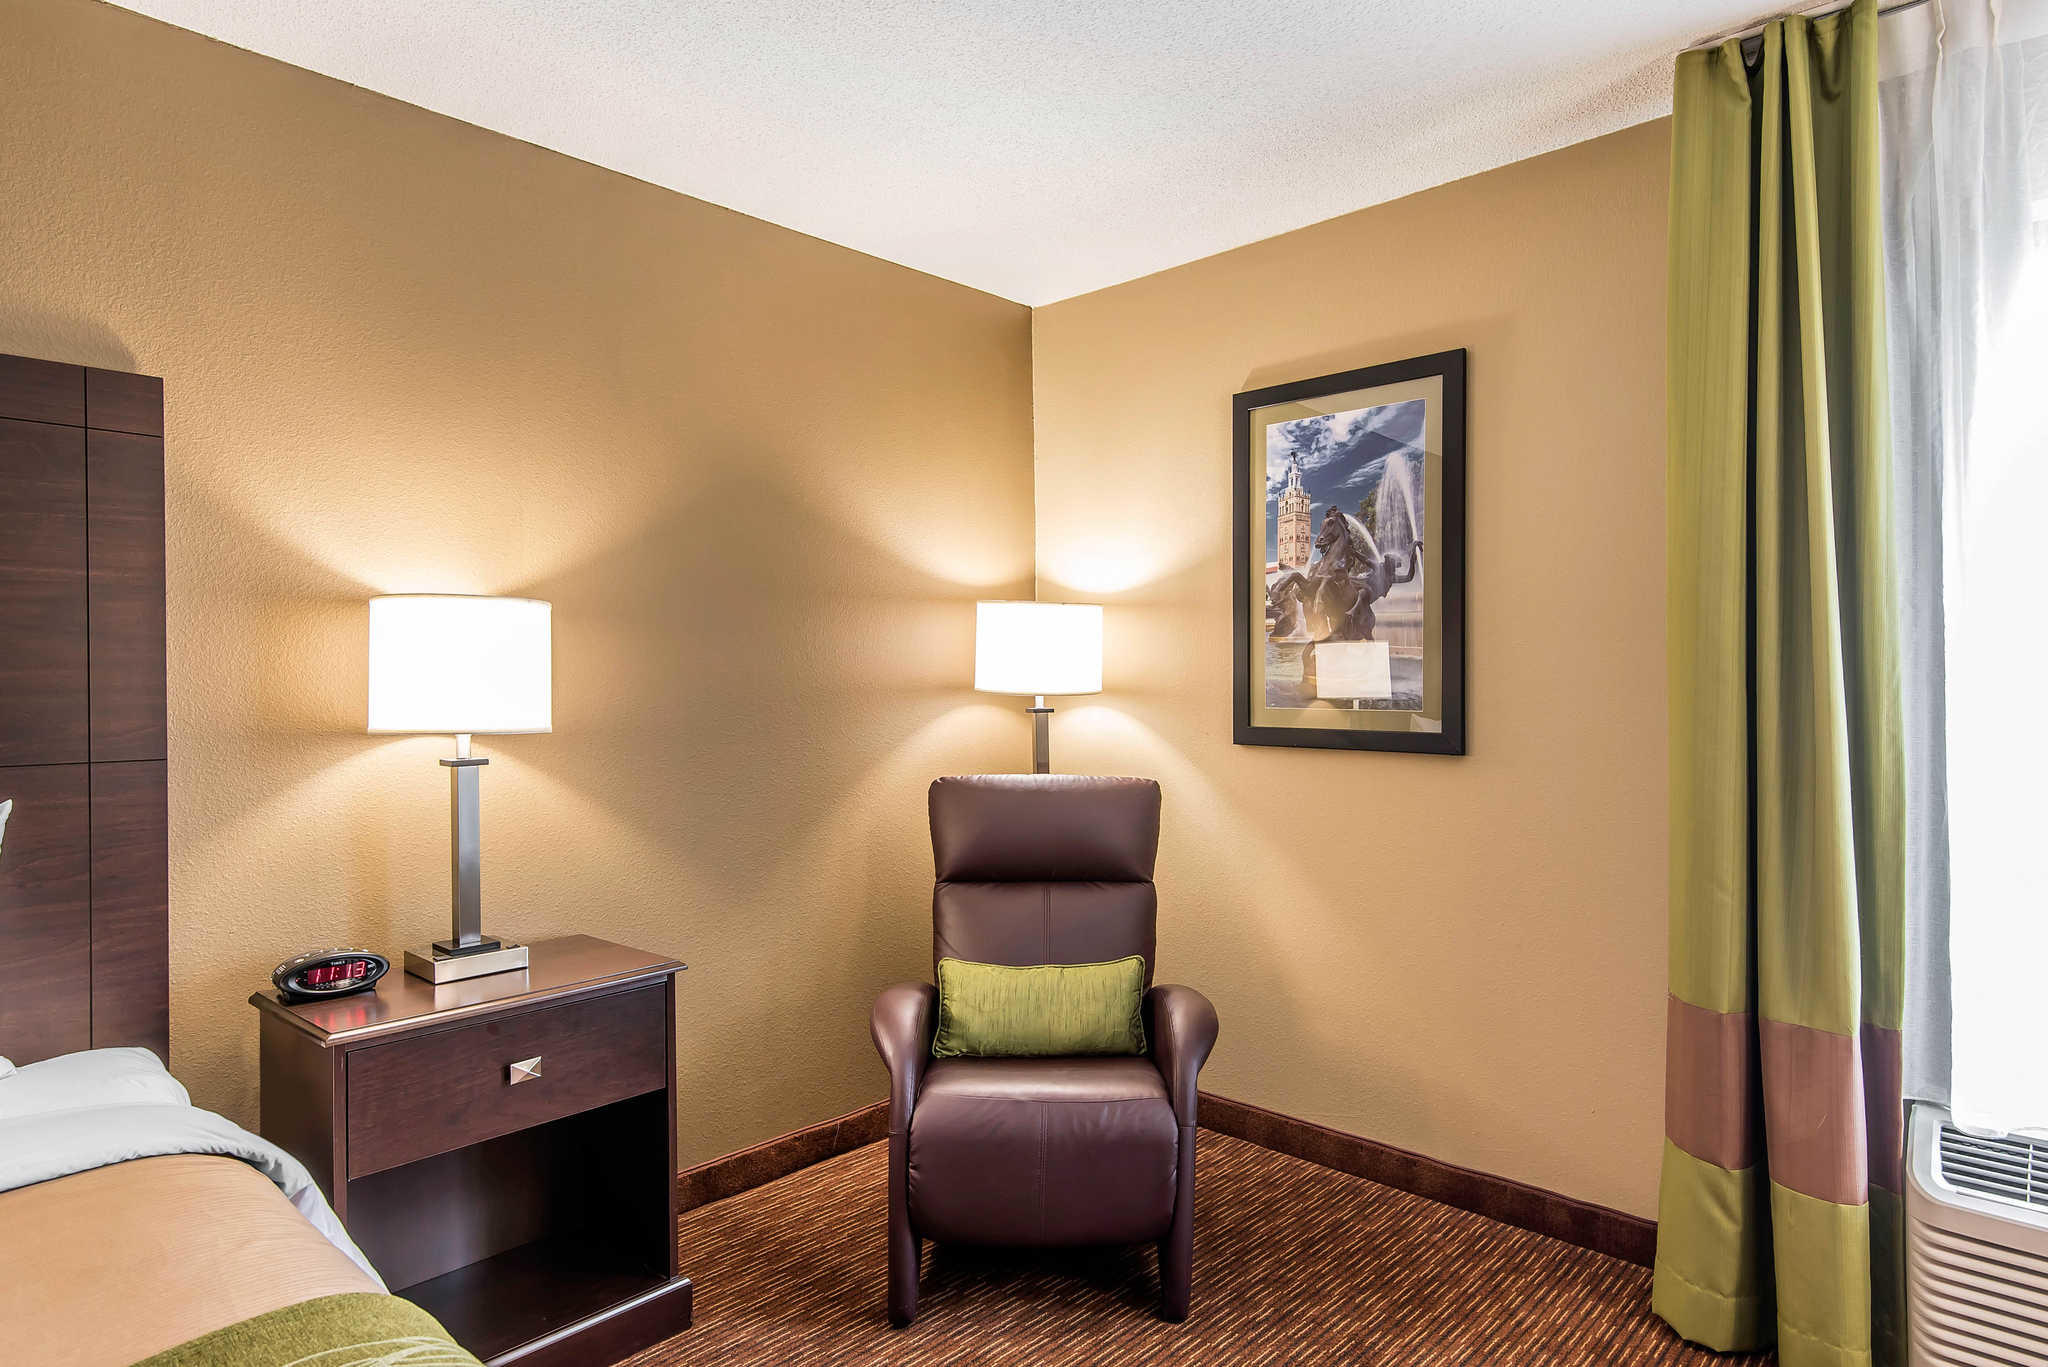 Comfort Inn & Suites Kansas City - Northeast image 11